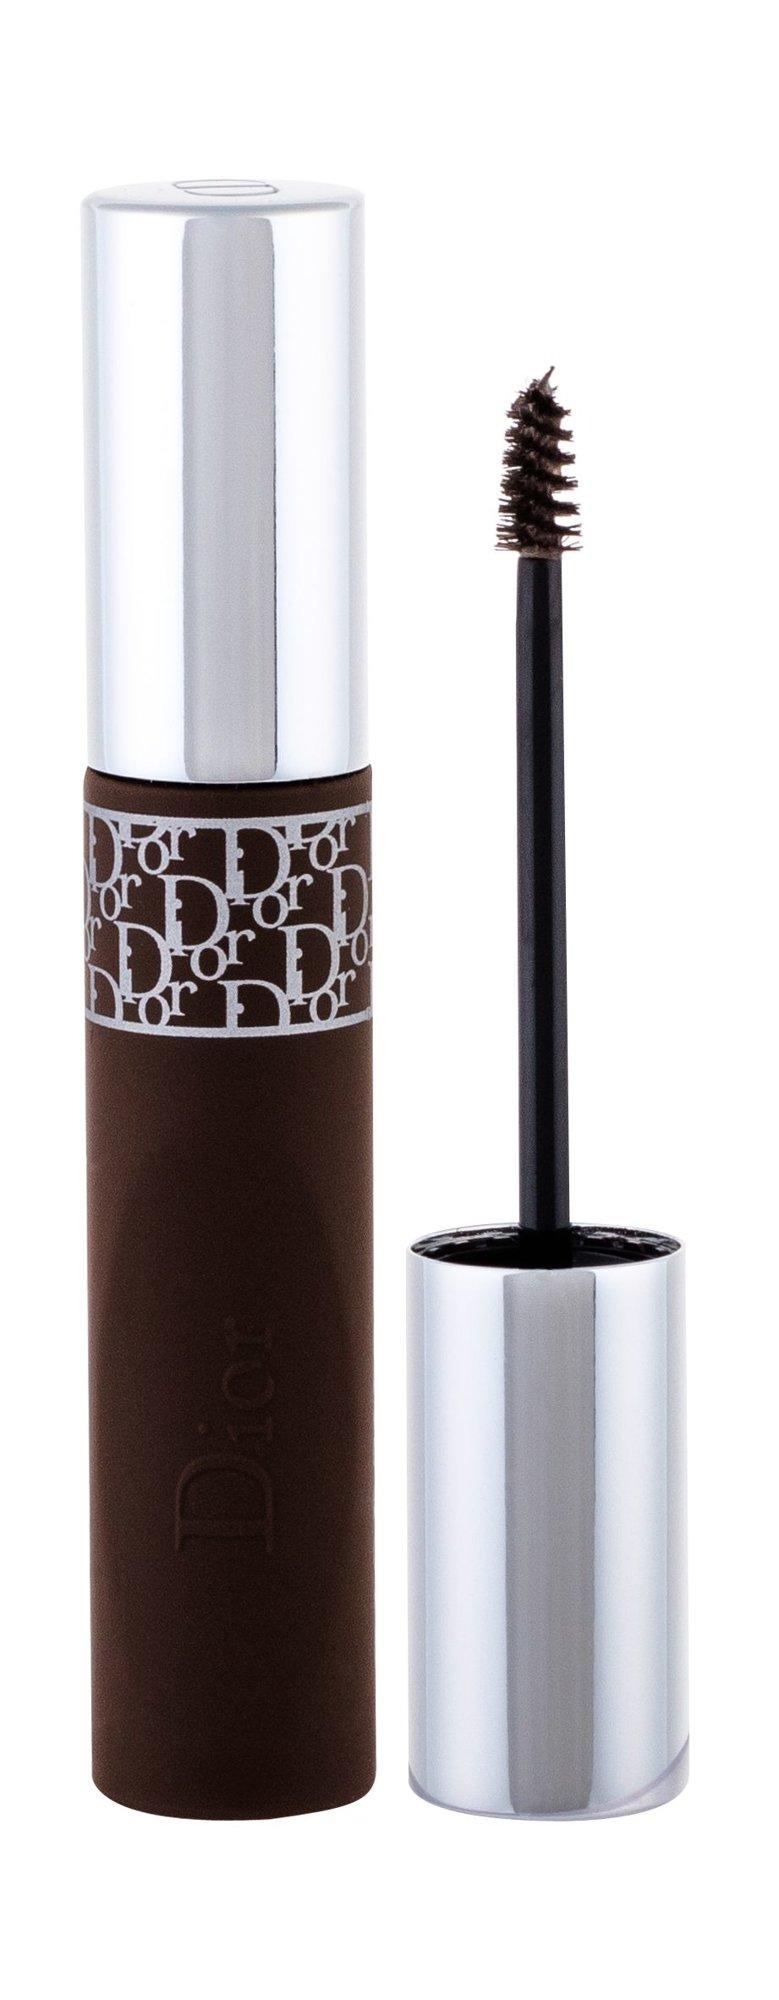 Christian Dior Diorshow Mascara 5ml 002 Dark Brown Pump´N´Volume Waterproof